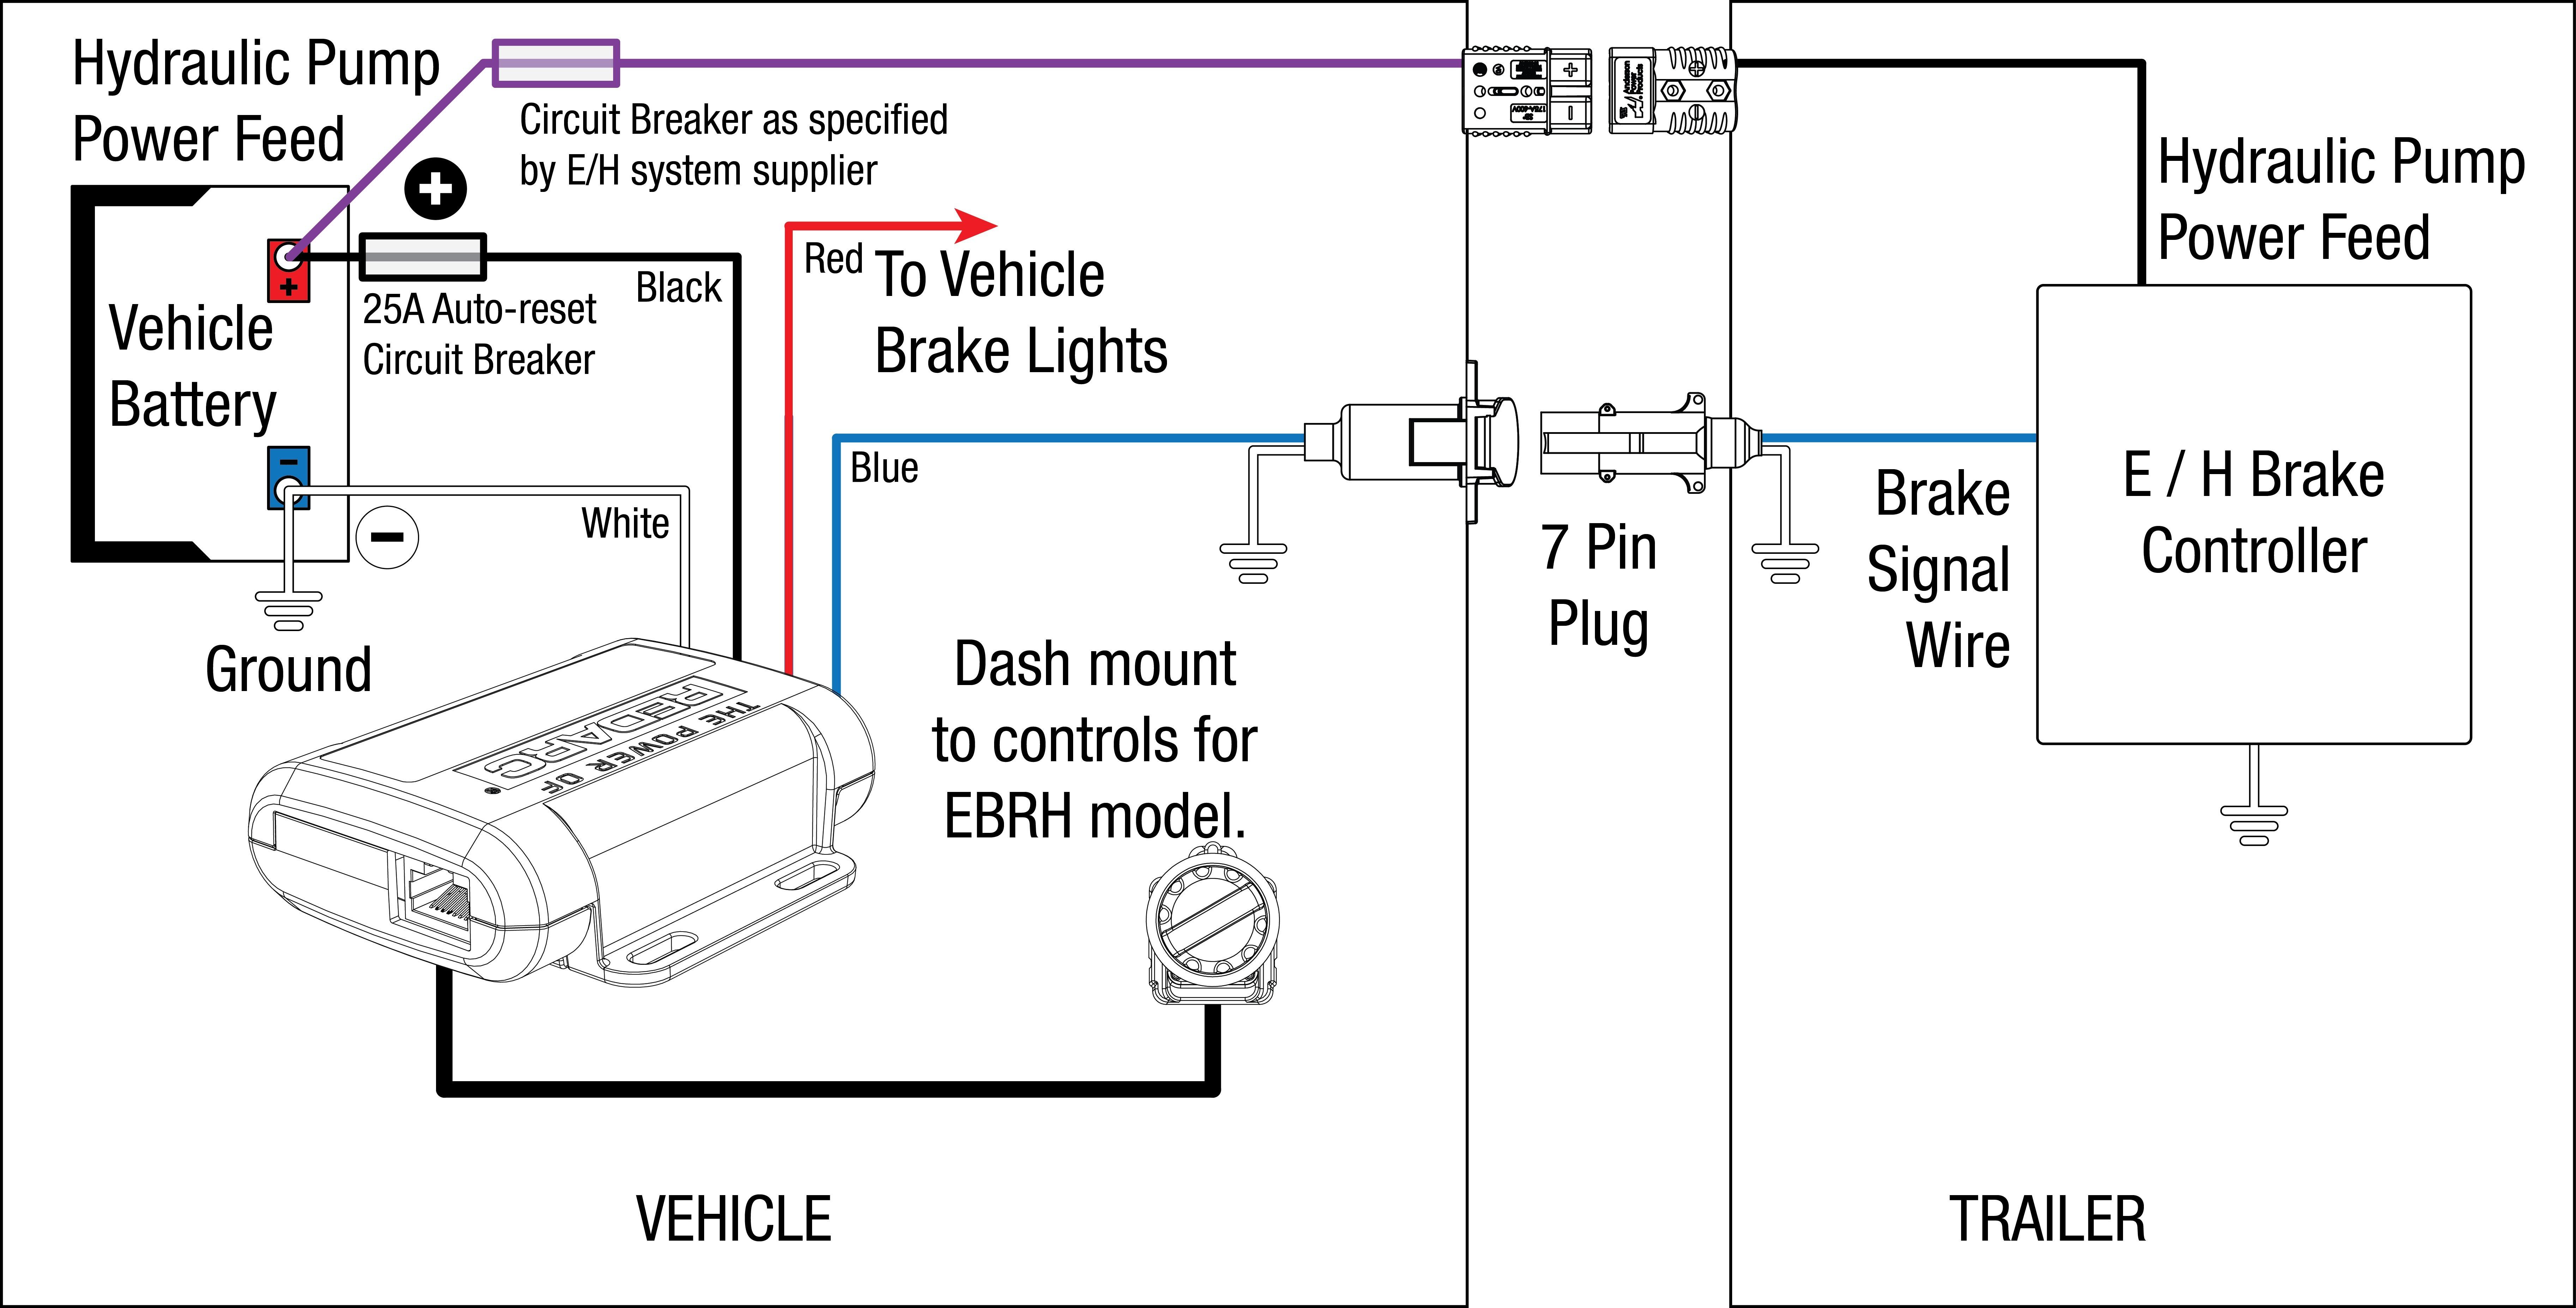 circuit breaker wiring diagram new wiring diagram image rh mainetreasurechest com Sterling SPP Fire Pumps Wiring Diagrams Yamaha Digital Control Box Wiring Diagram